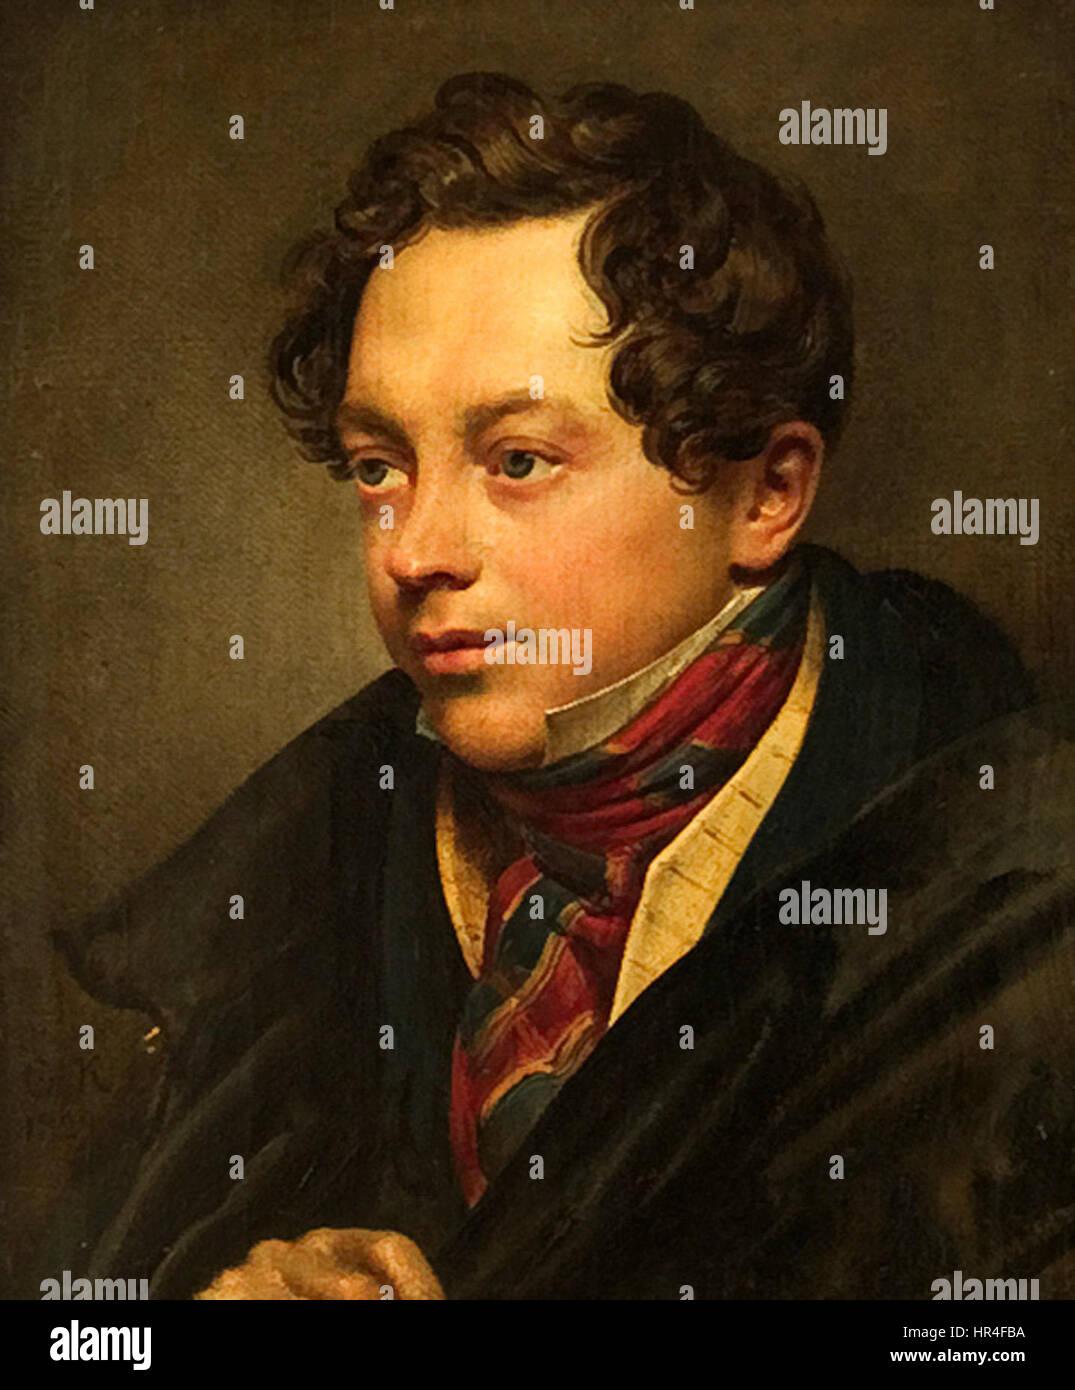 Orest Adamovich Kiprensky: paintings, brief biography 44